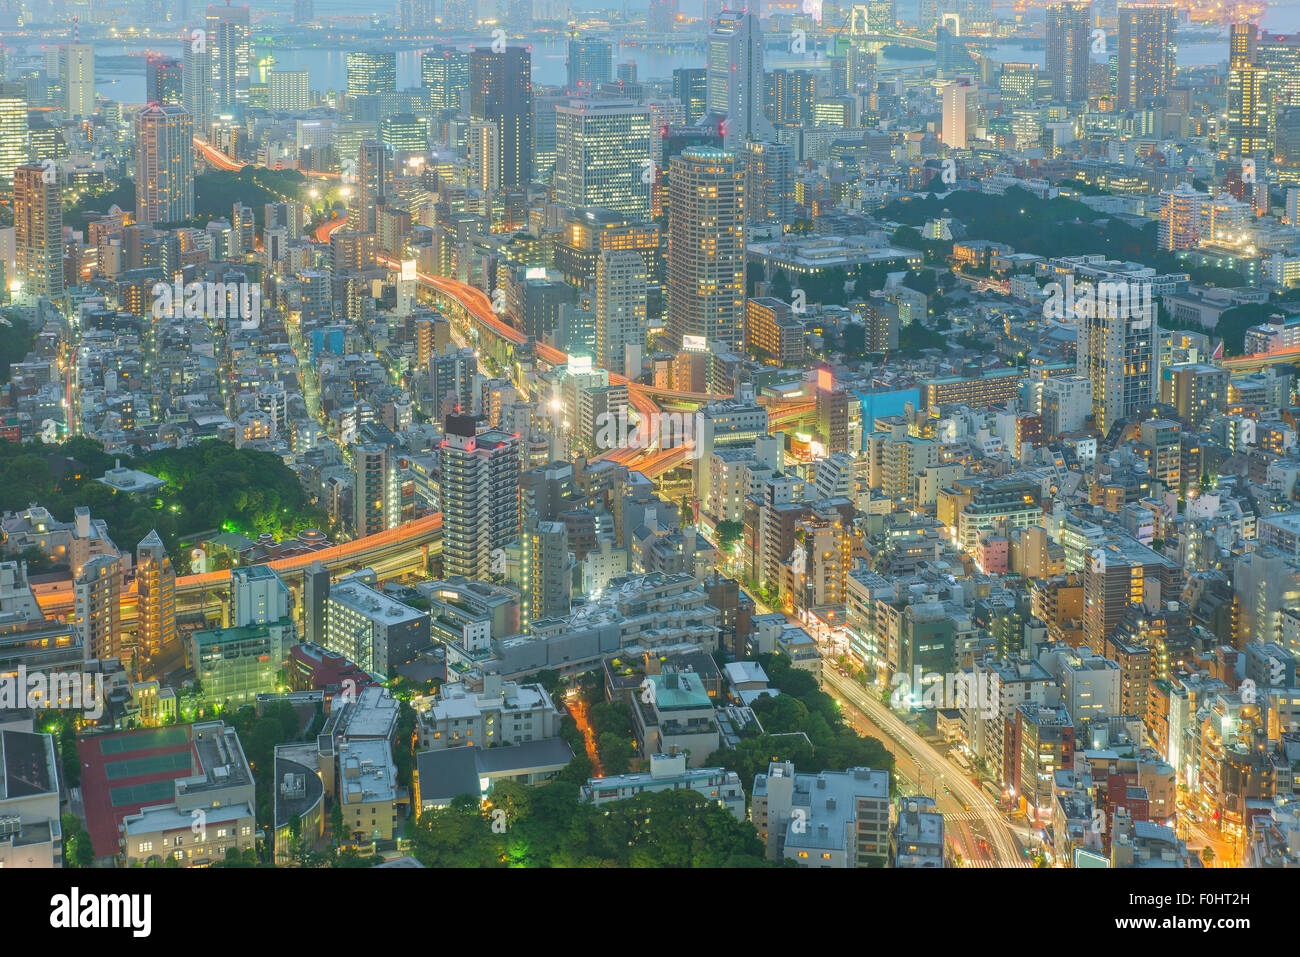 Tokyo, Japan Stadtbild und Autobahnen Stockbild